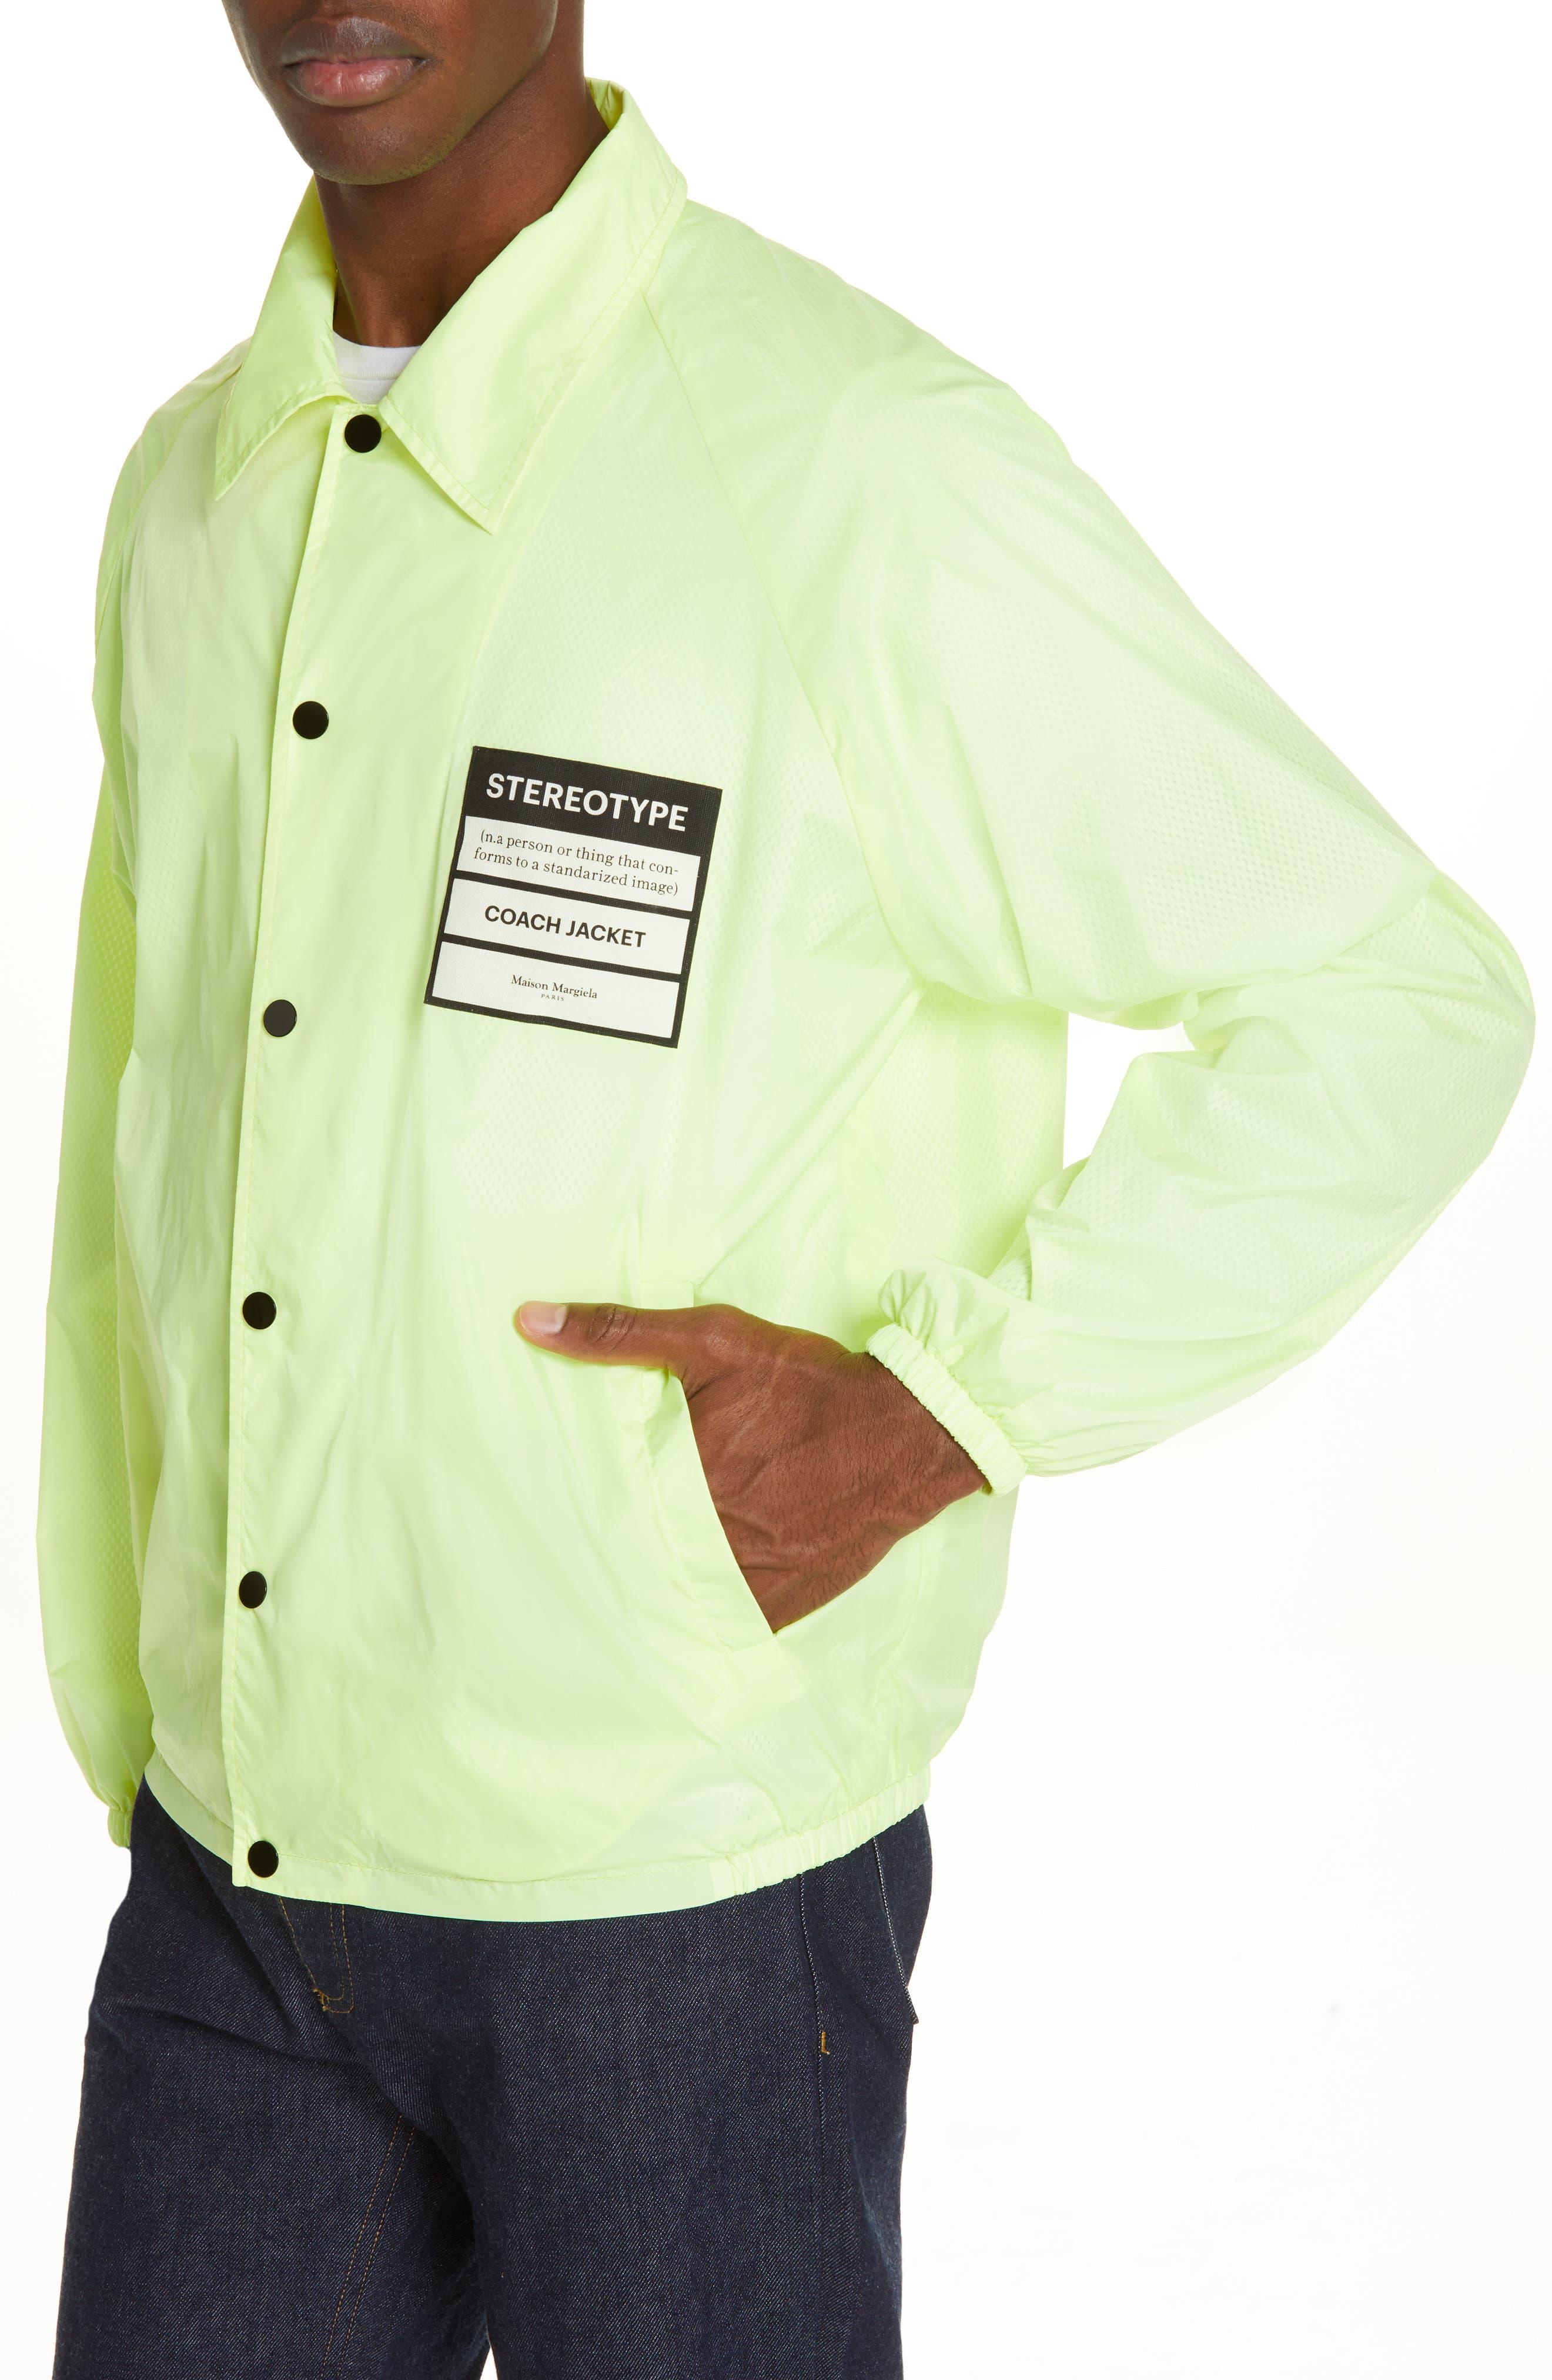 MAISON MARGIELA, Stereotype Coach's Jacket, Alternate thumbnail 4, color, NEON YELLOW